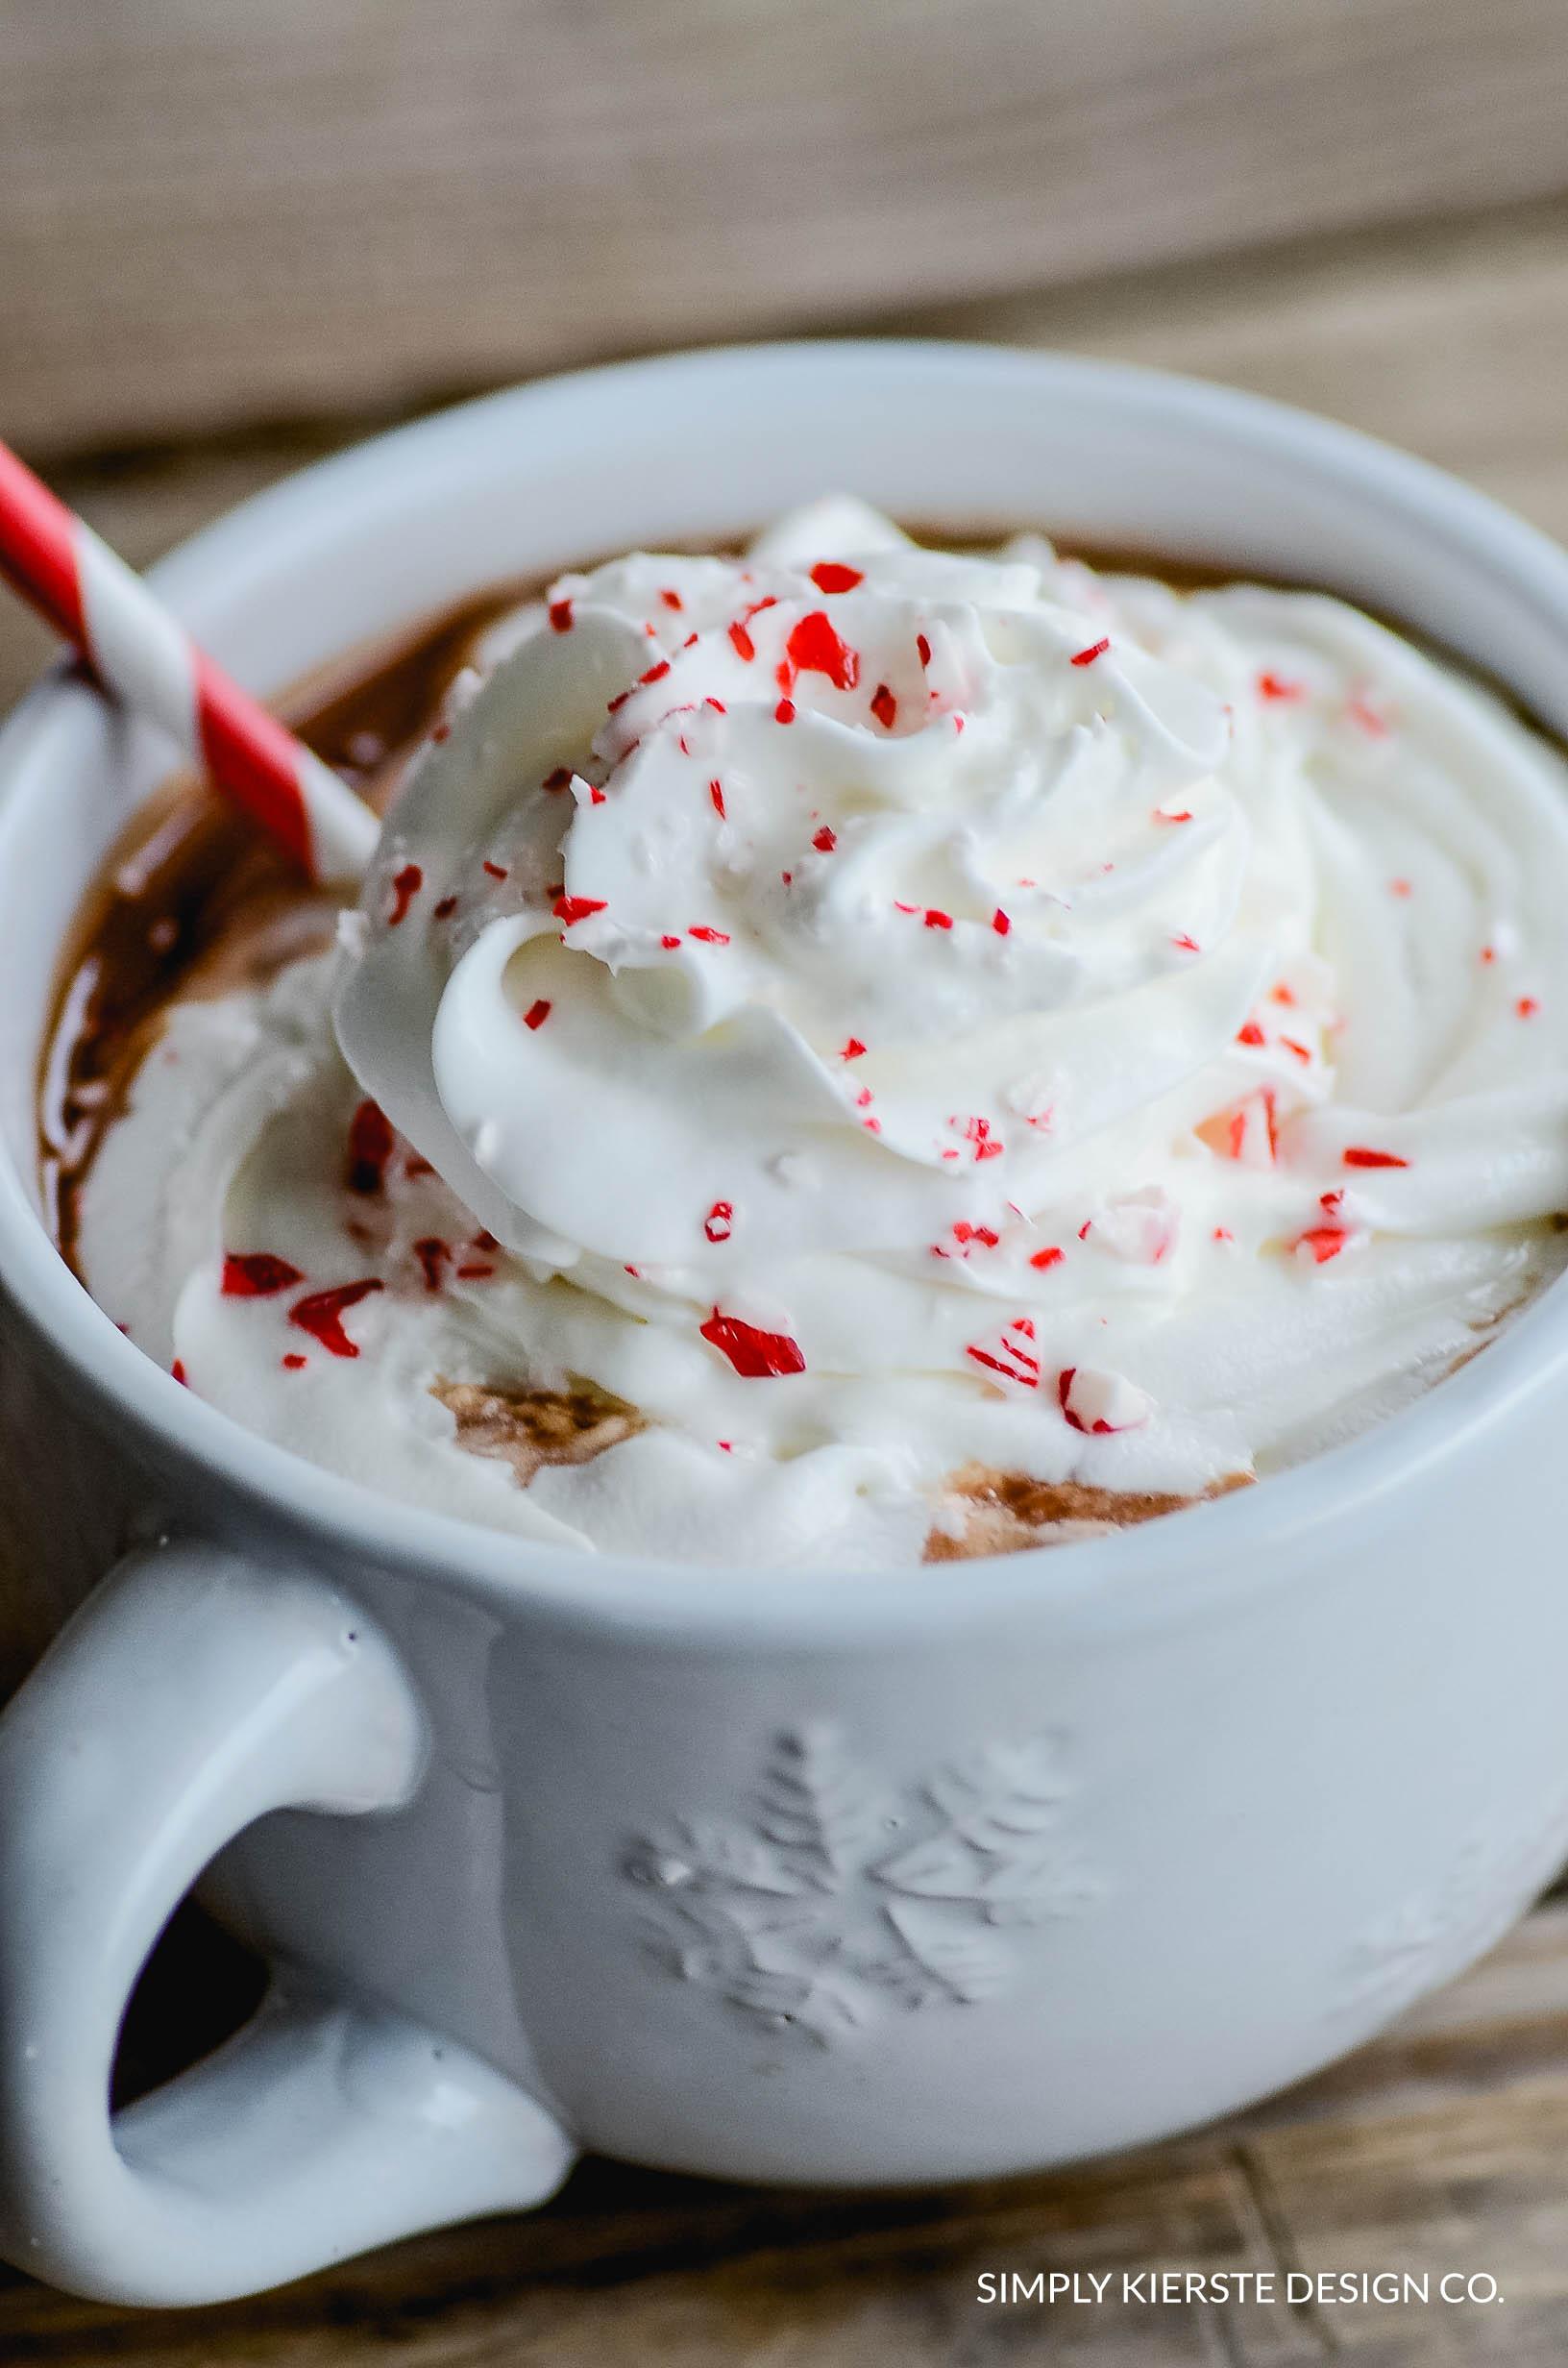 The BEST Homemade Hot Chocolate with Peppermint Cream | oldsaltfarm.com #peppermint #hotchocolate #whippedcream